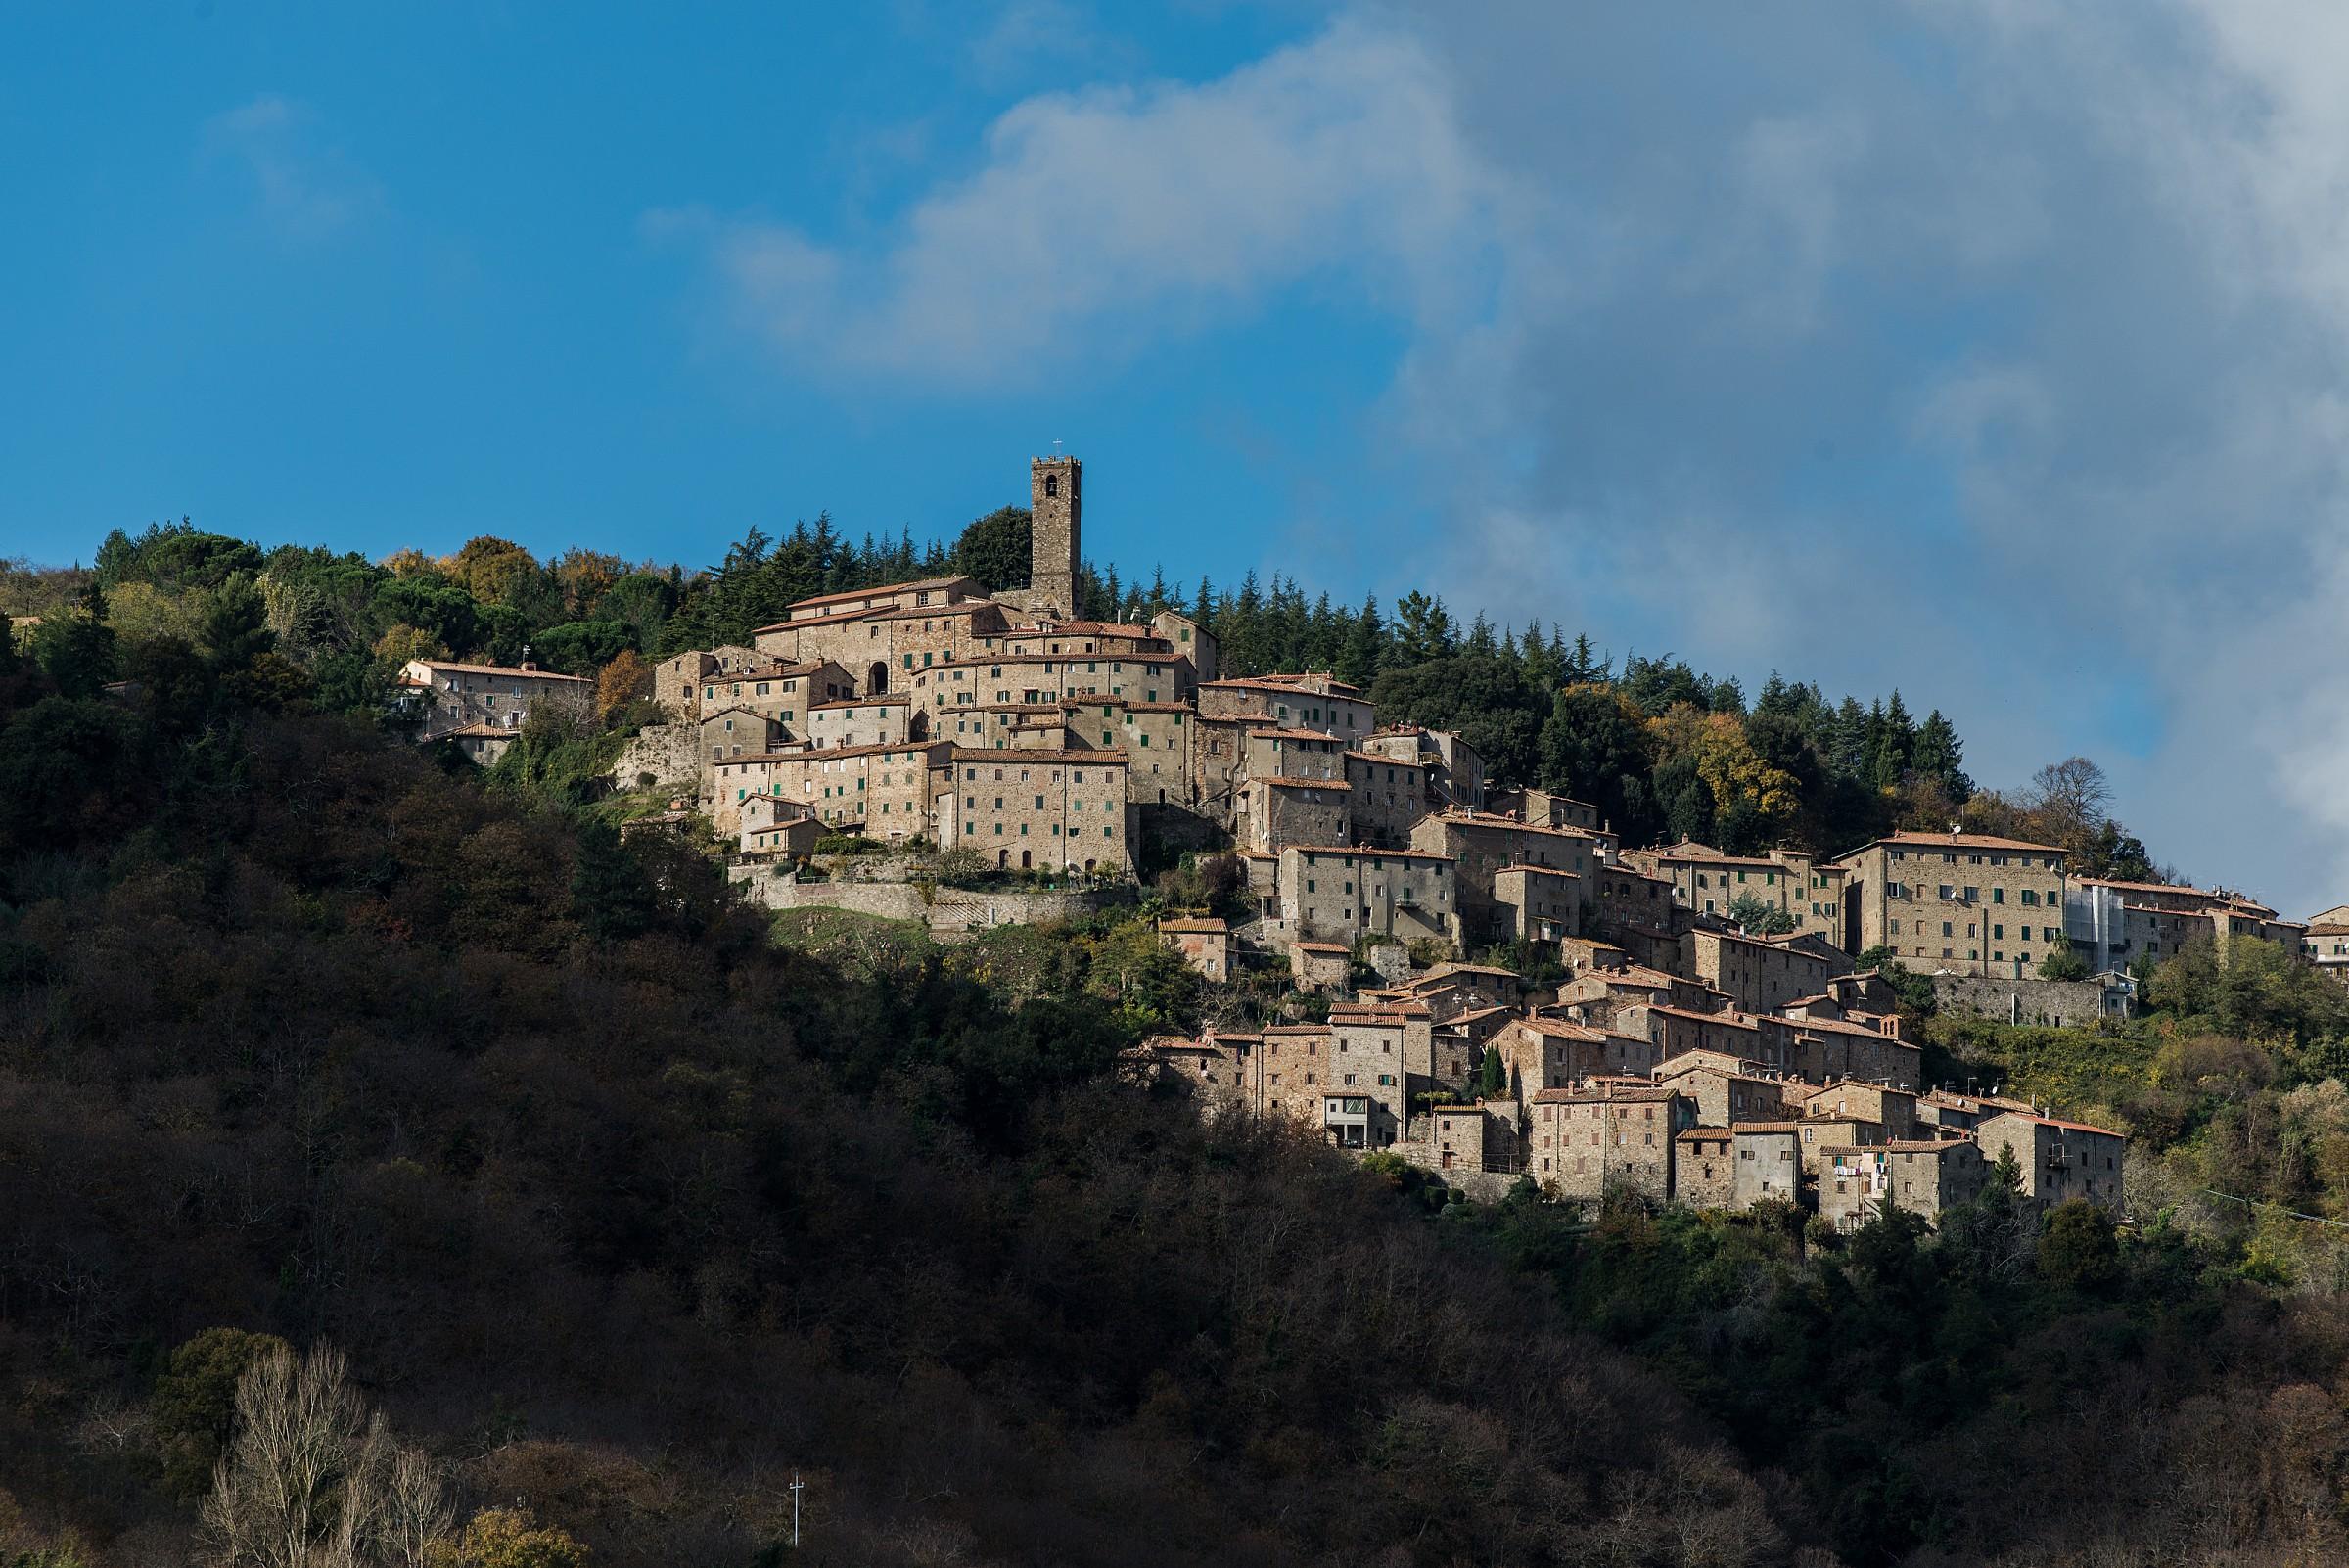 Castelnuovo dal Pavone...